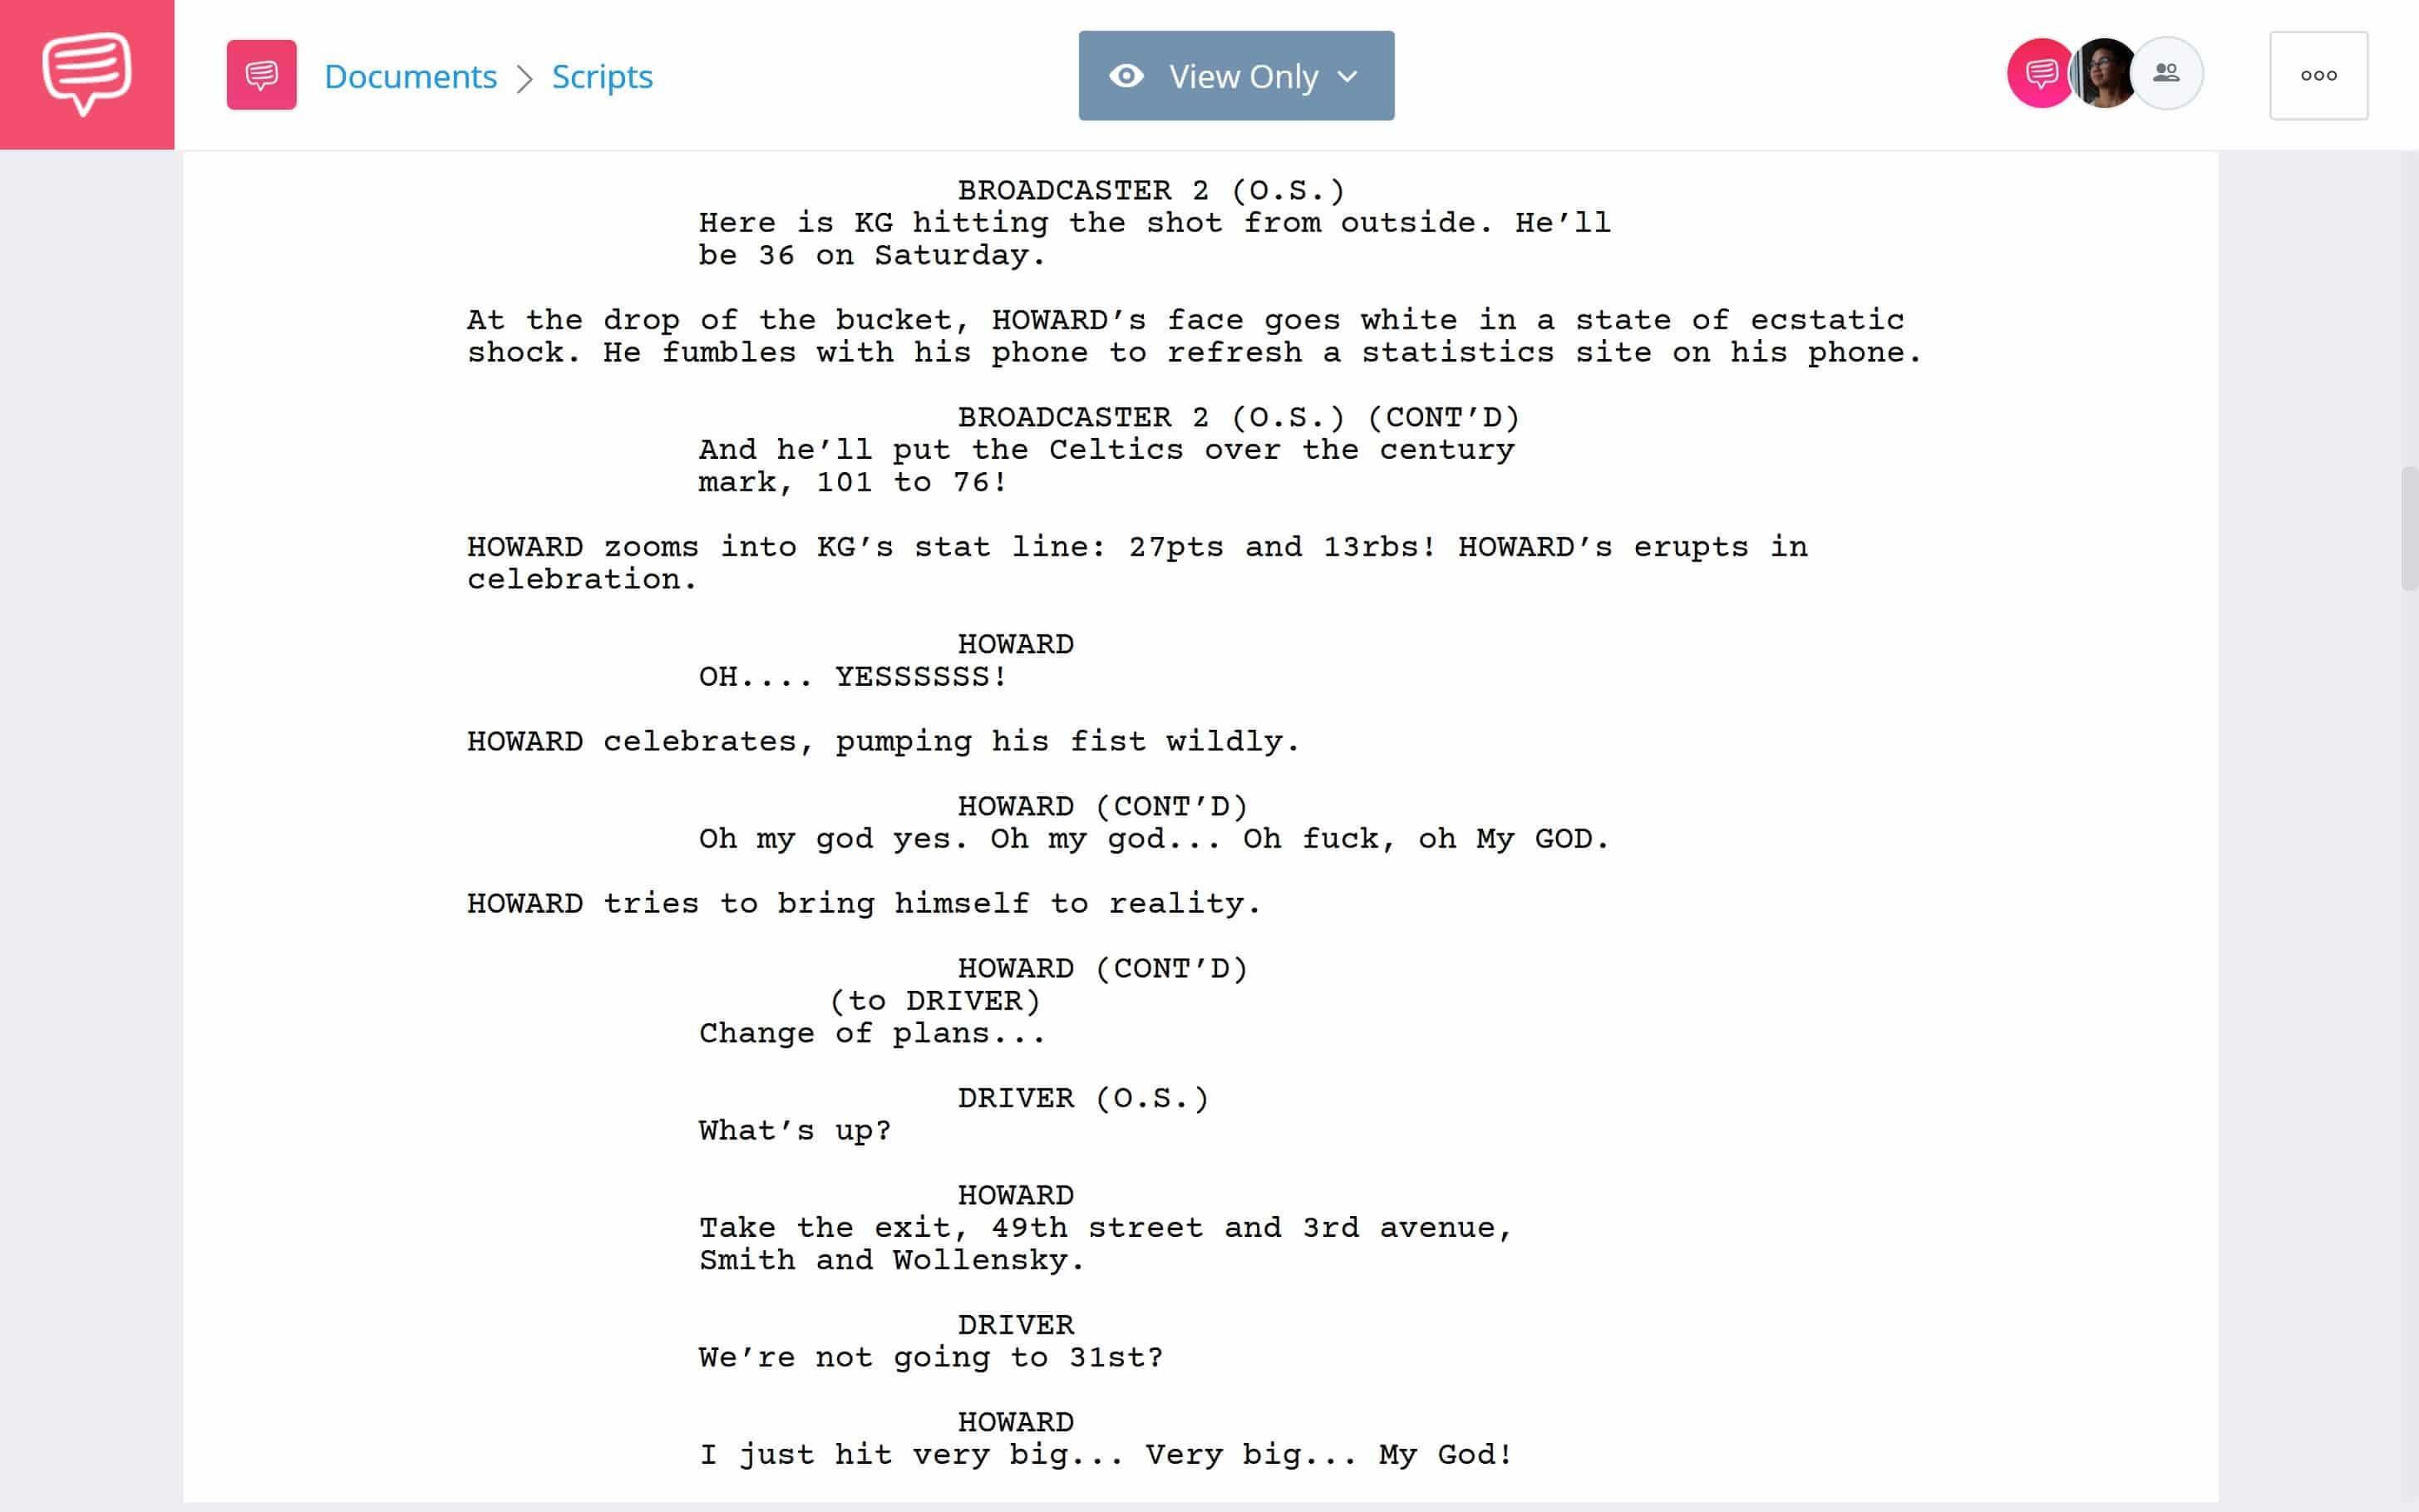 Creative Examples of Writing Fiction Based on True Events - Garnett Court Domination Scene Download App Tie-In - StudioBinder